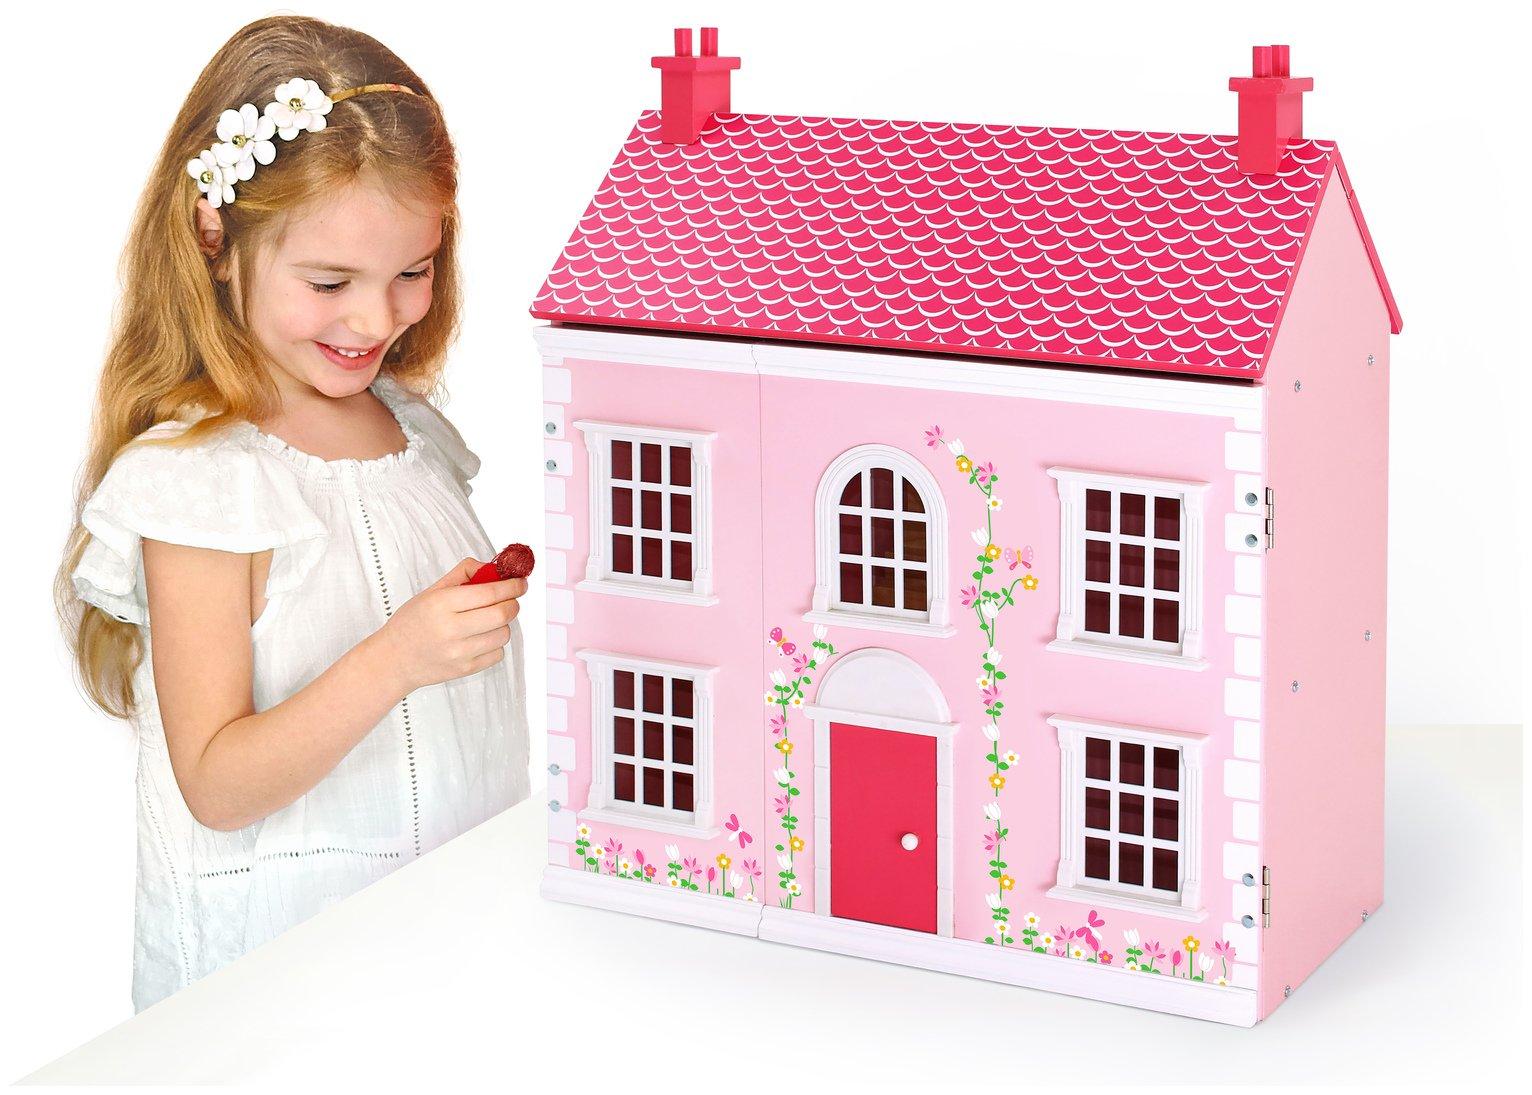 Buy Chad Valley Wooden 3 Storey Dolls House Dolls Houses Argos